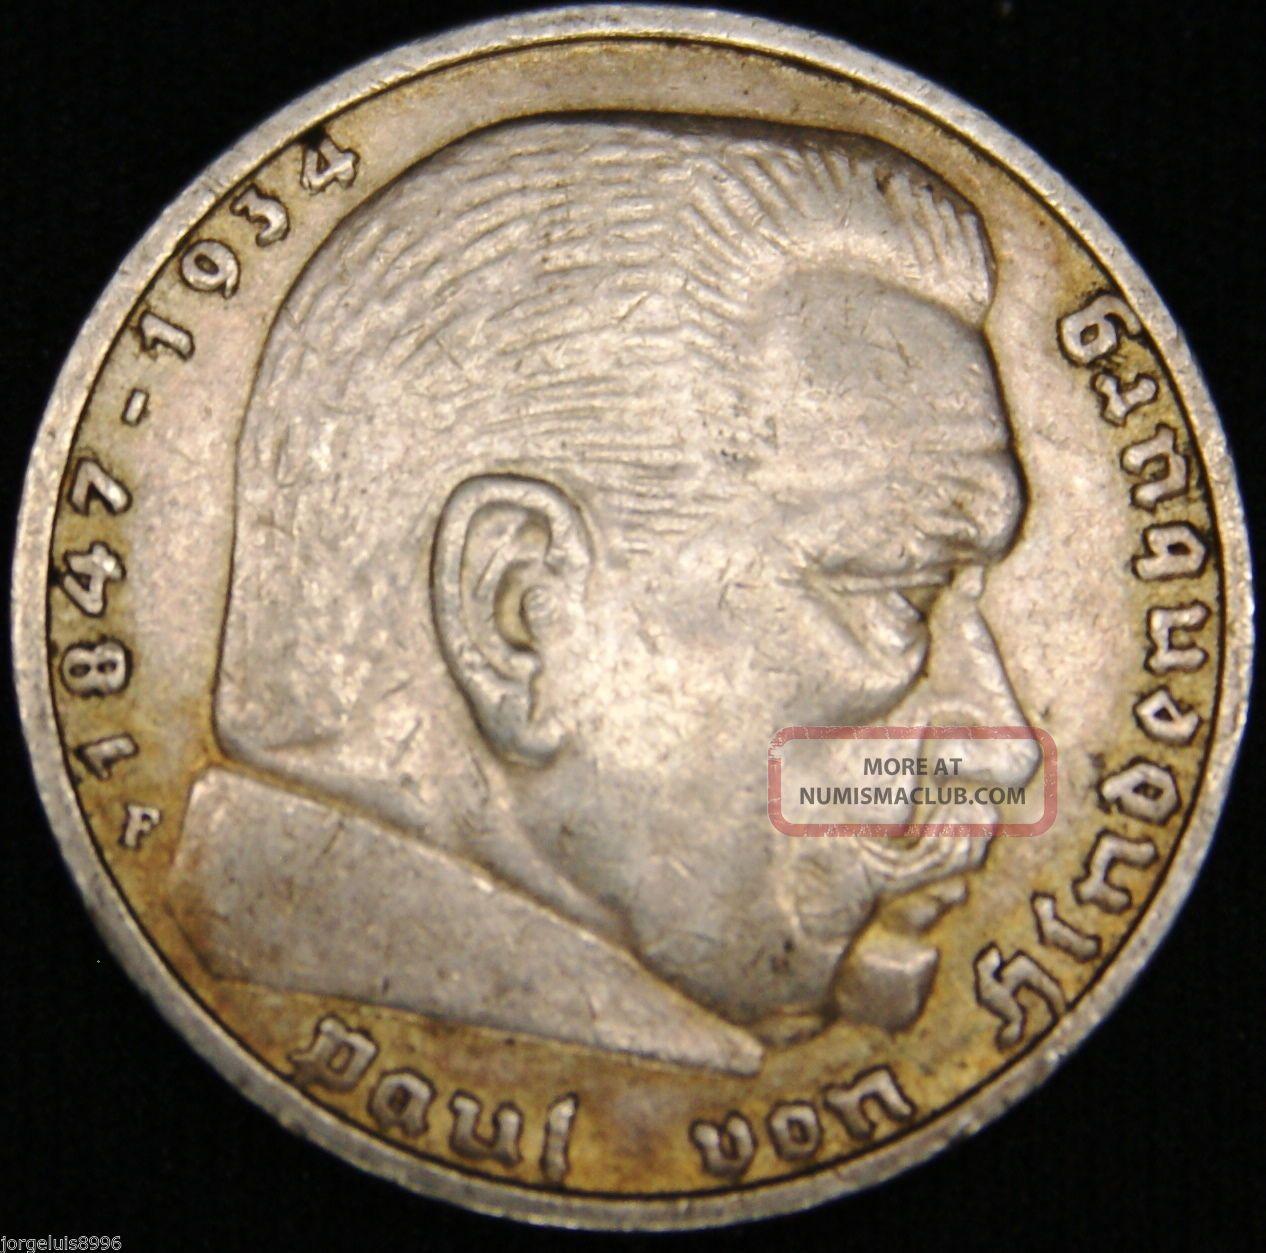 German Nazi Silver Coin 5 Rm 1937 F Big Swastika